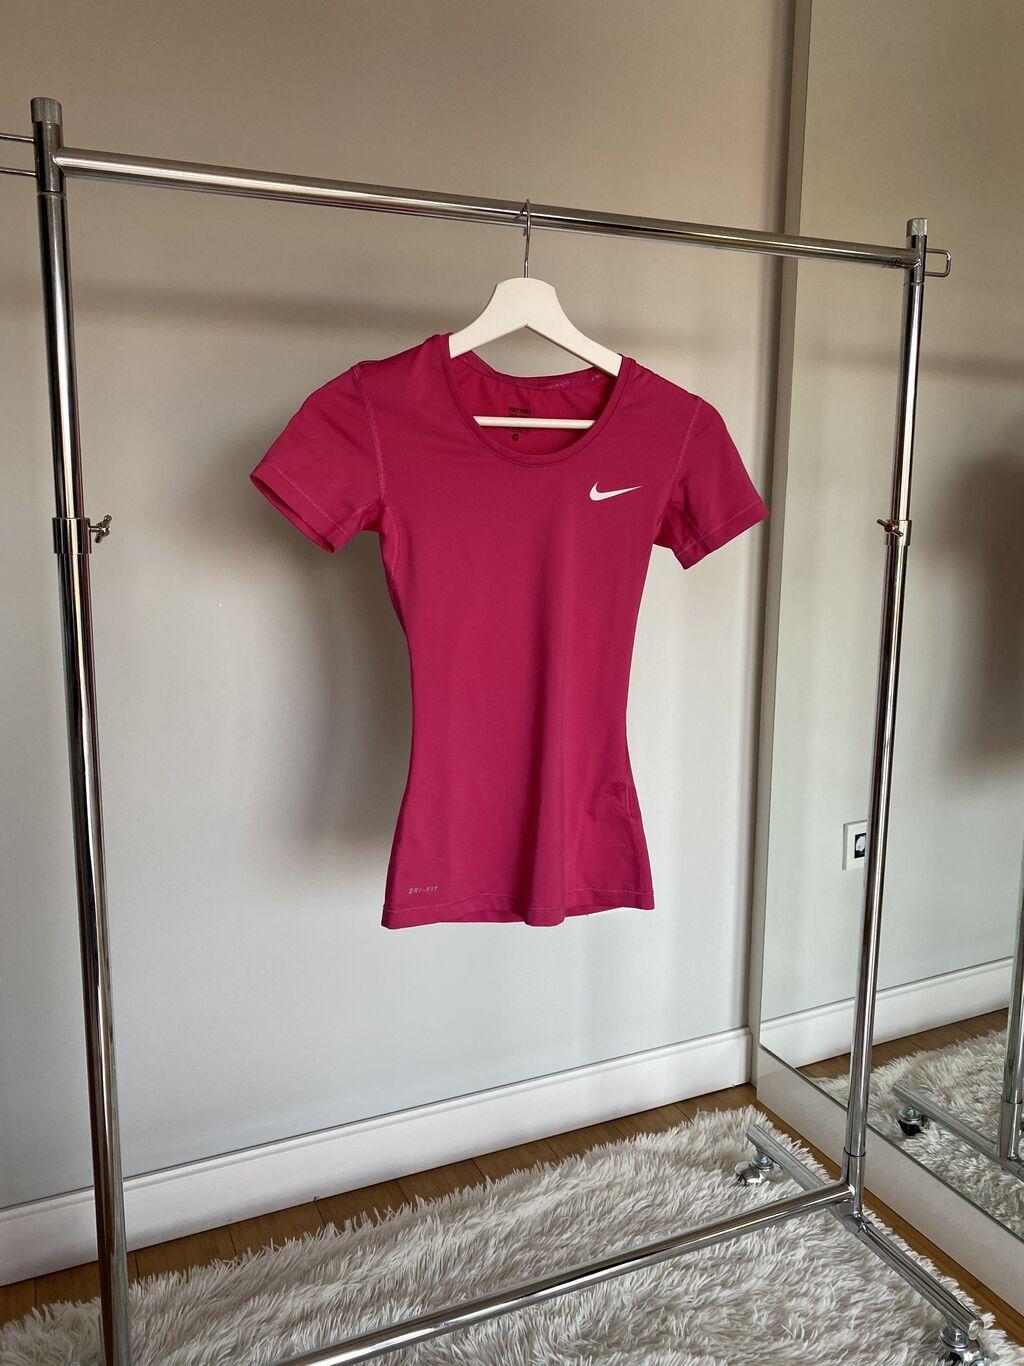 Ženske majice - Beograd: Nike original majica za trening. Velicina xs. Puna elastina. Obucena